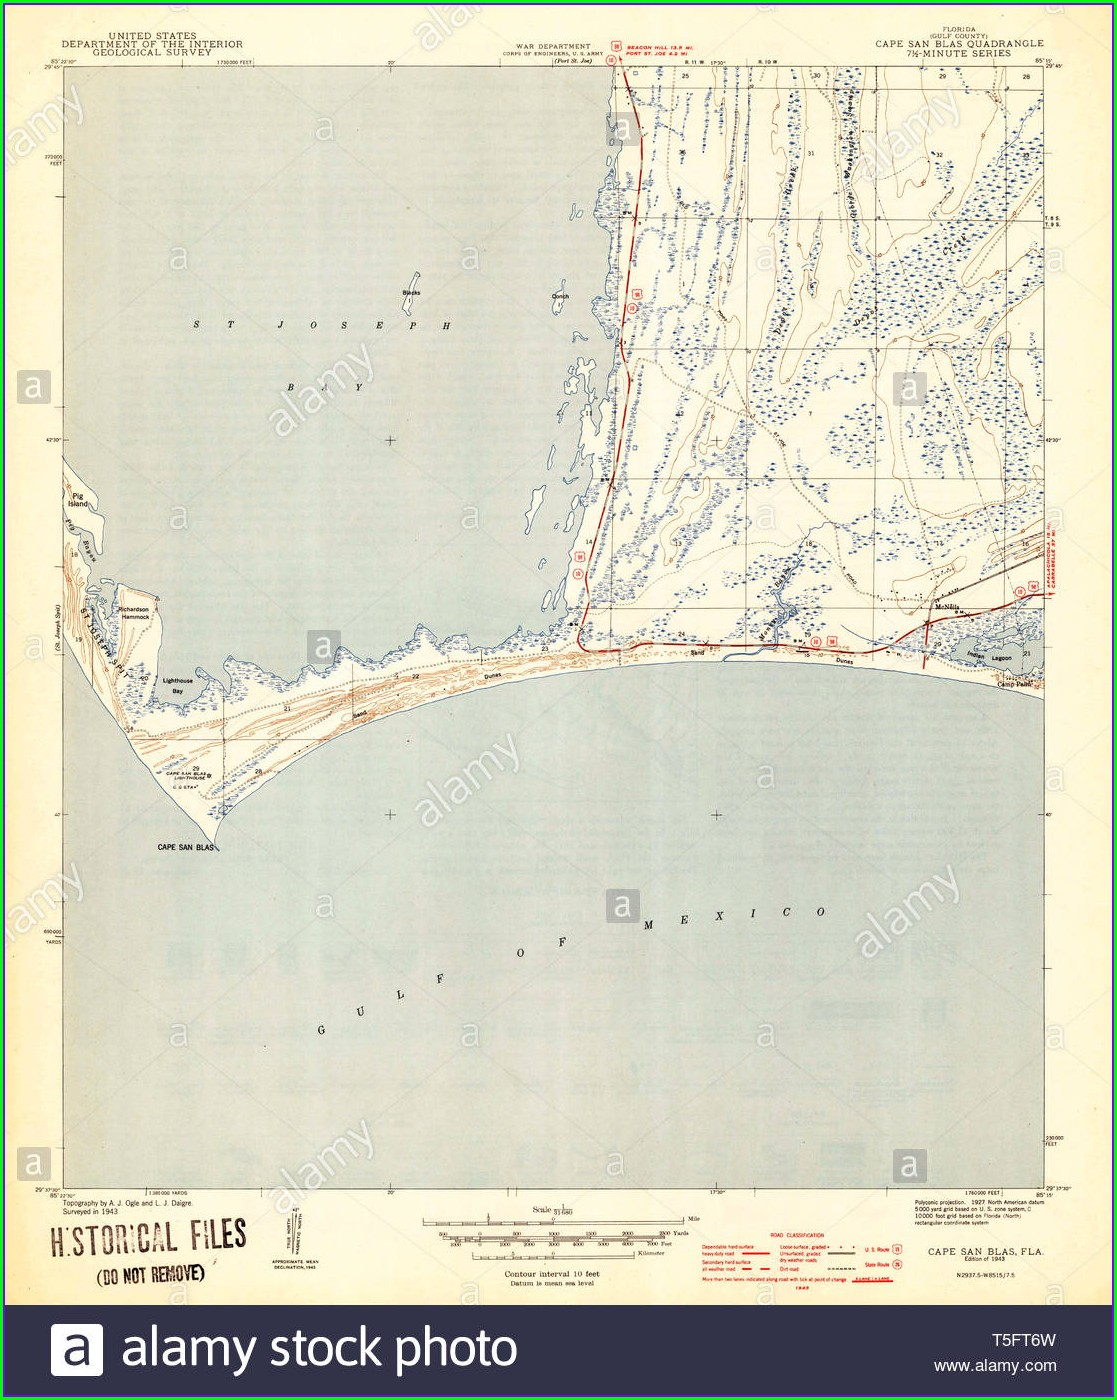 Cape San Blas Map